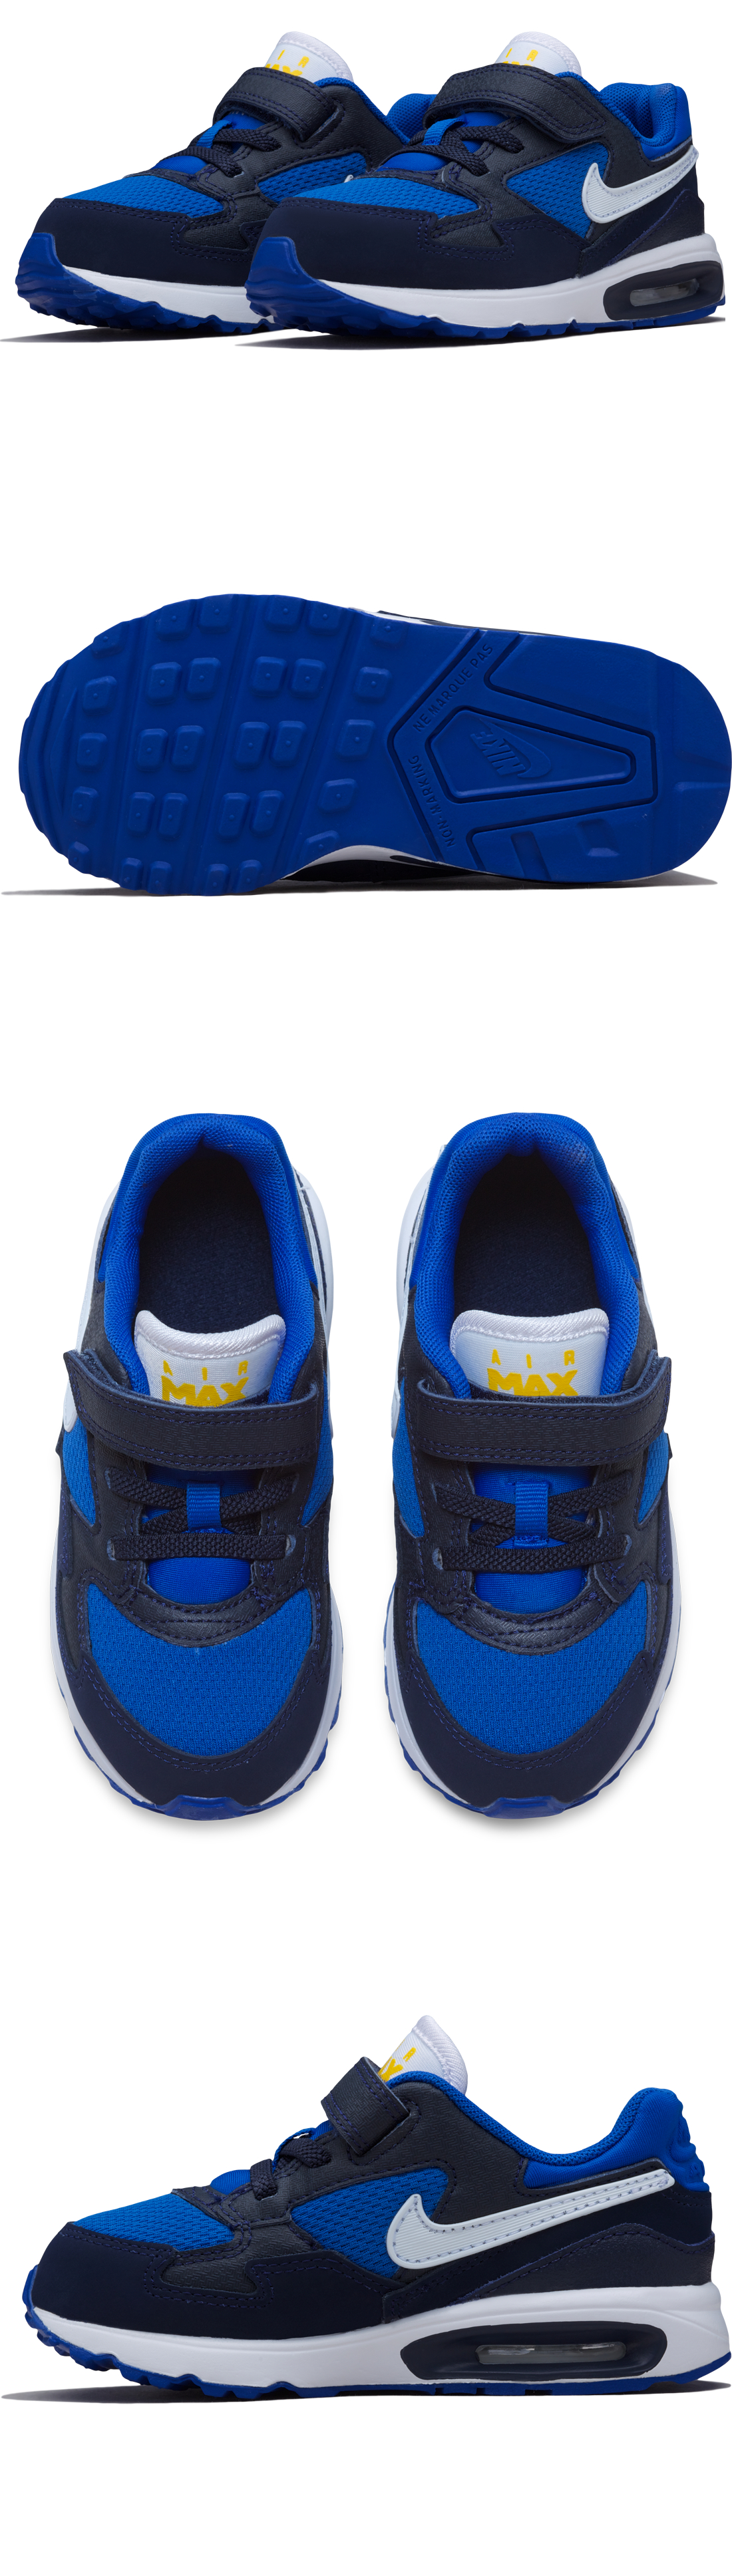 Baby Shoes Nike Air Max St Tdv Toddler Kids Boy Girls Shoes